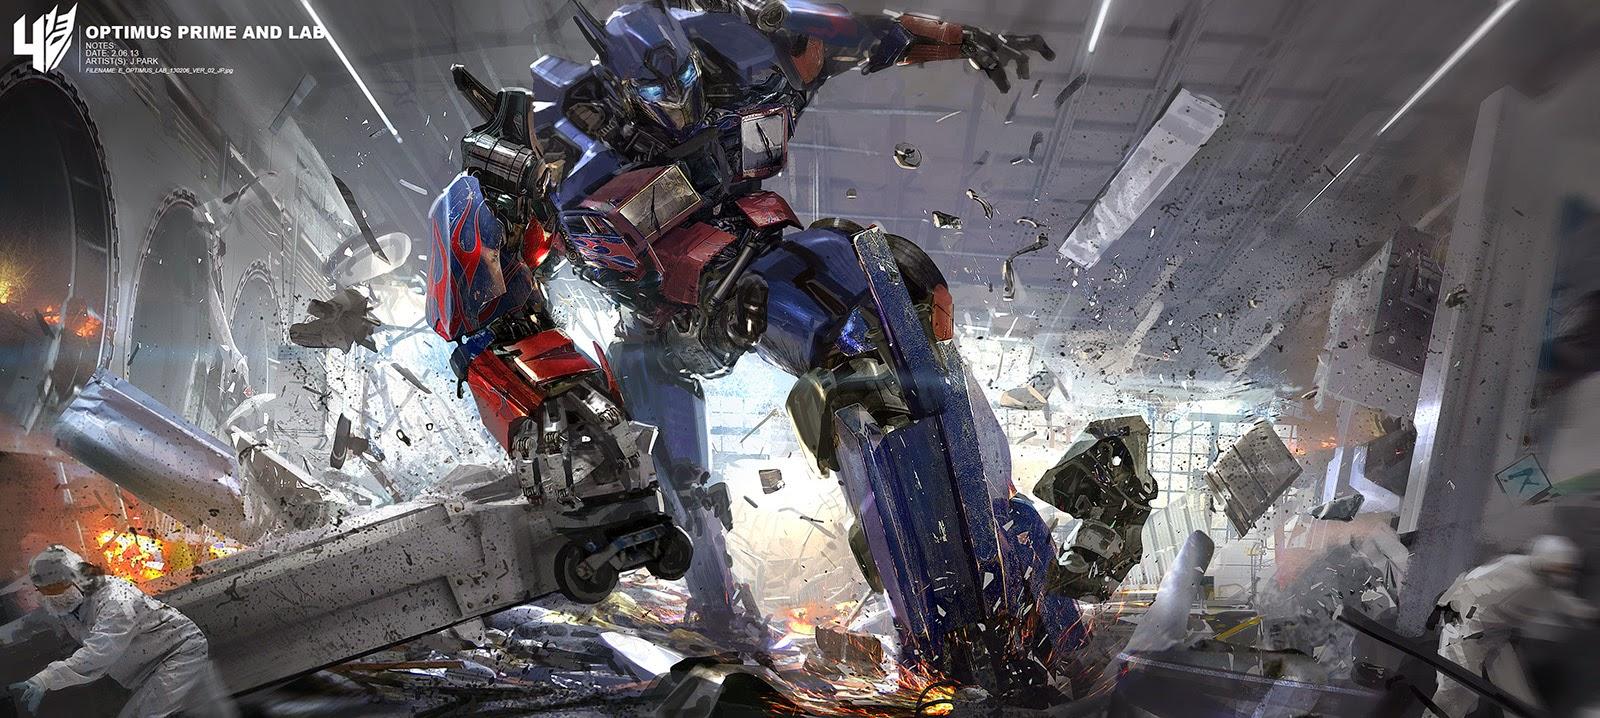 JohnsBlog: Transformers 4 Concept Art!!